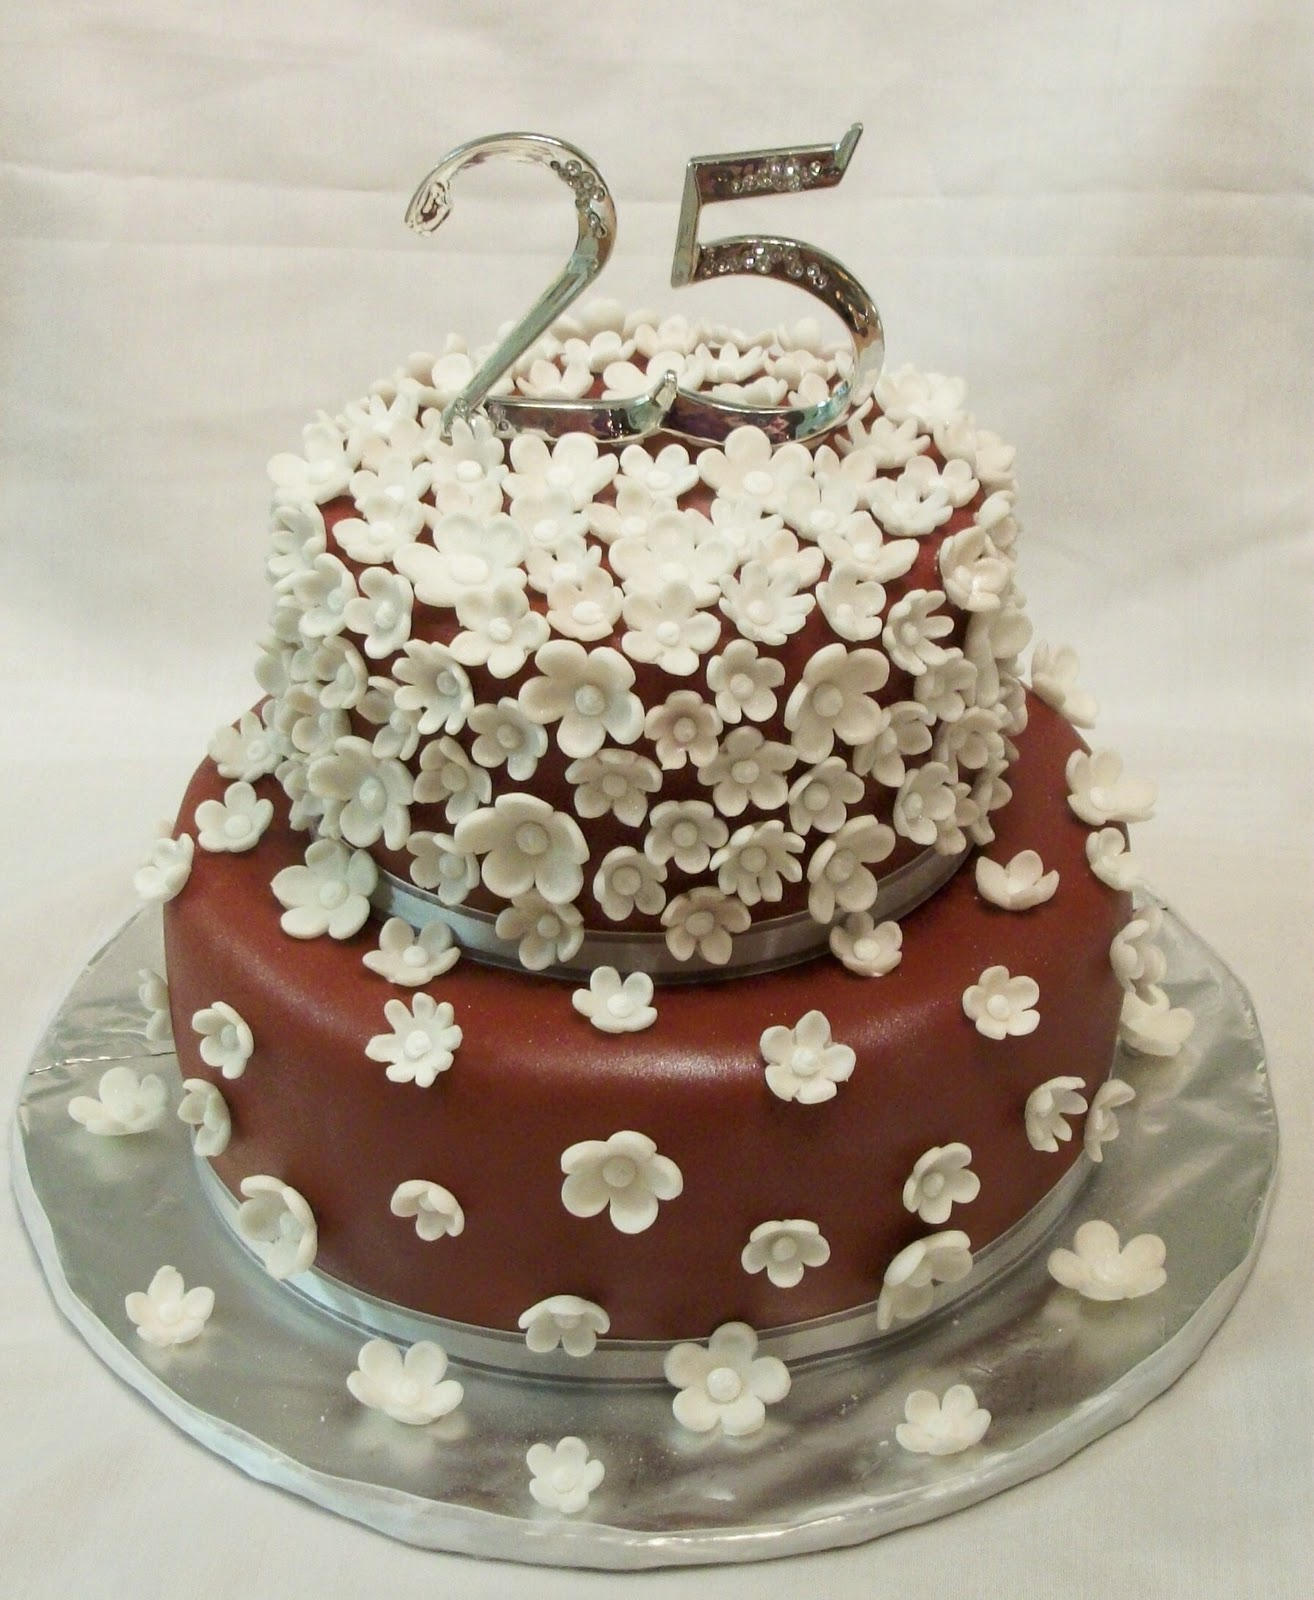 25th Wedding Anniversary Cake Designs